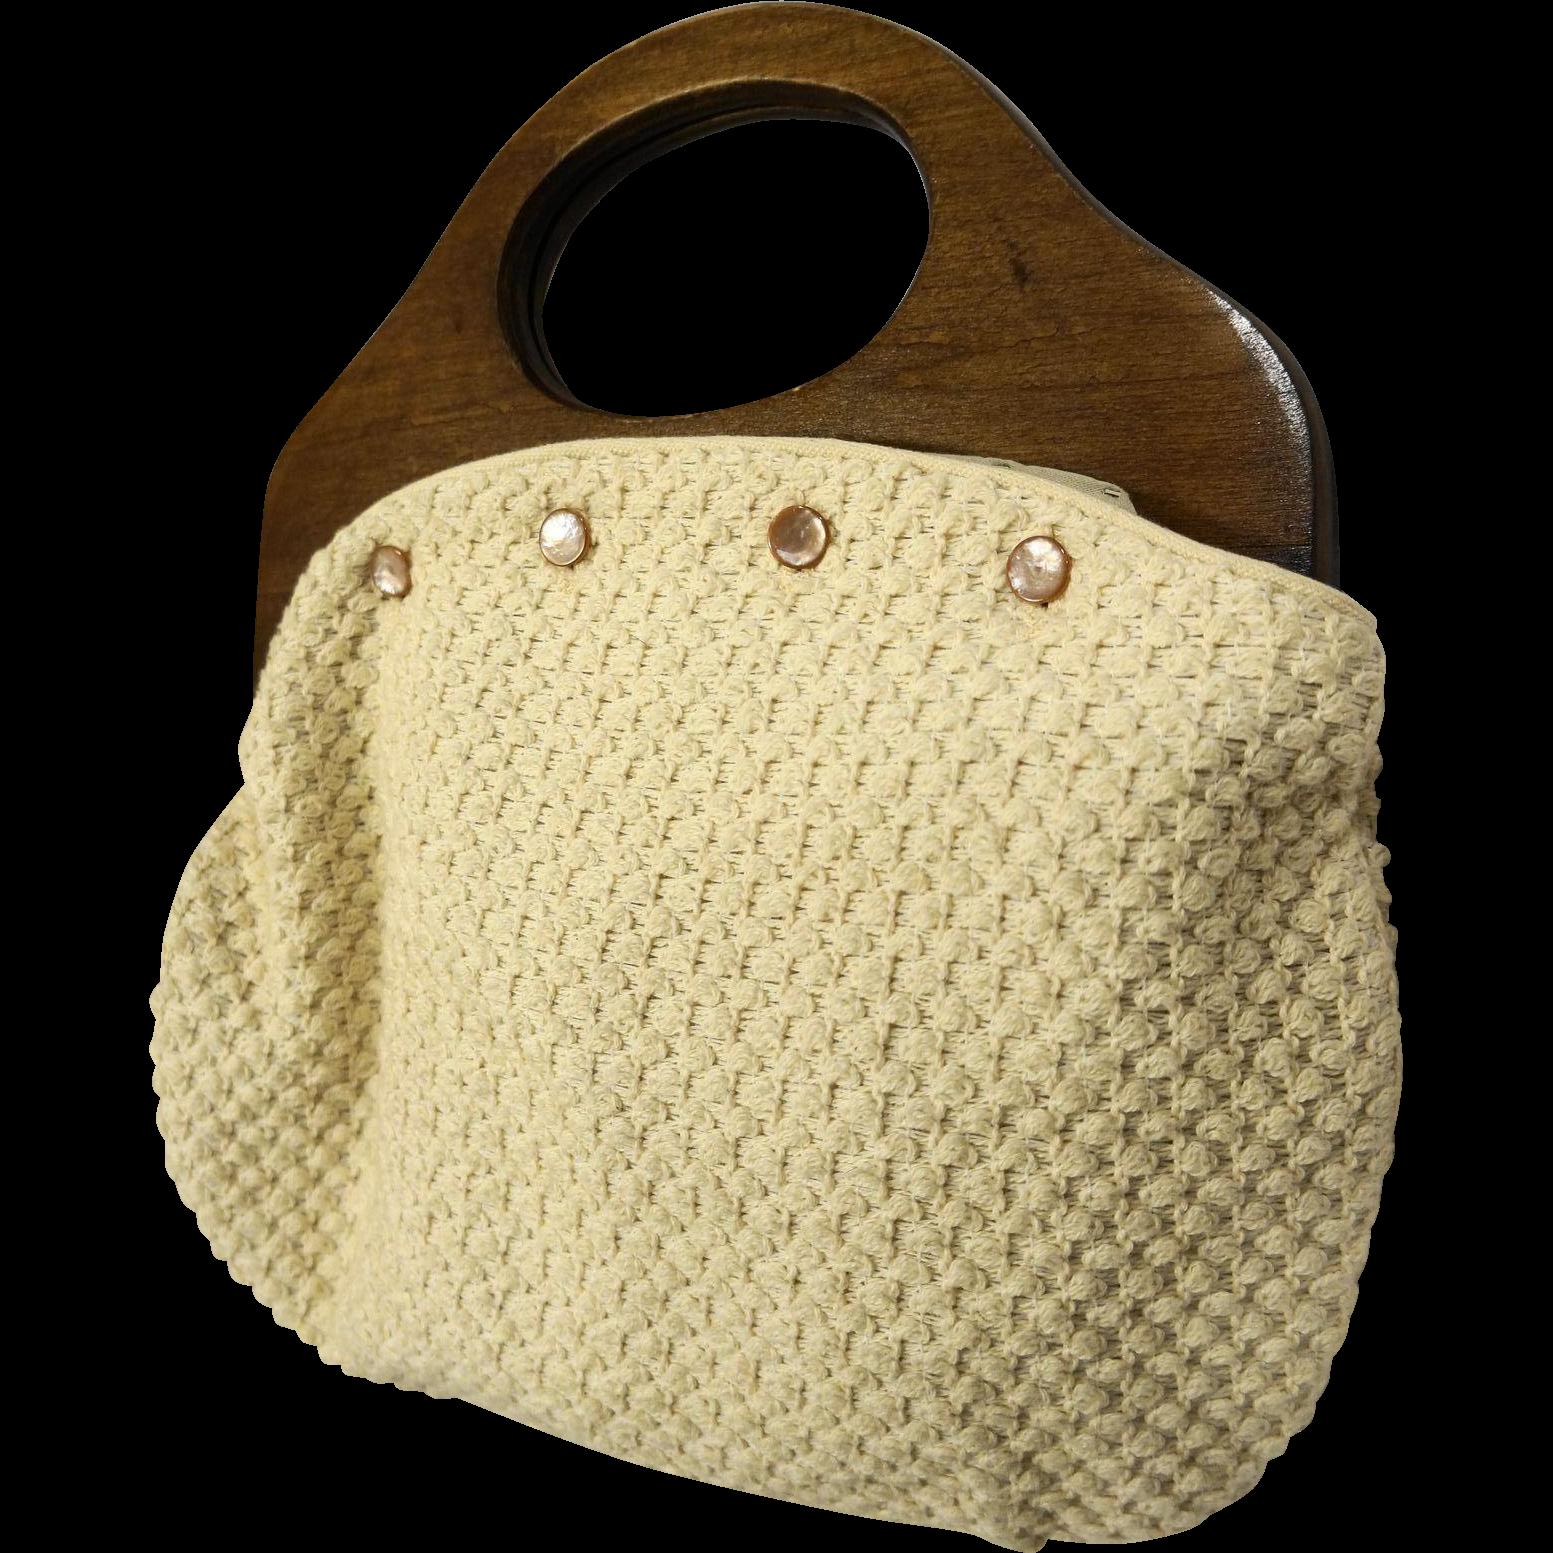 Bermuda Bag Purse Wooden Handle 5 Covers Plaids Solids